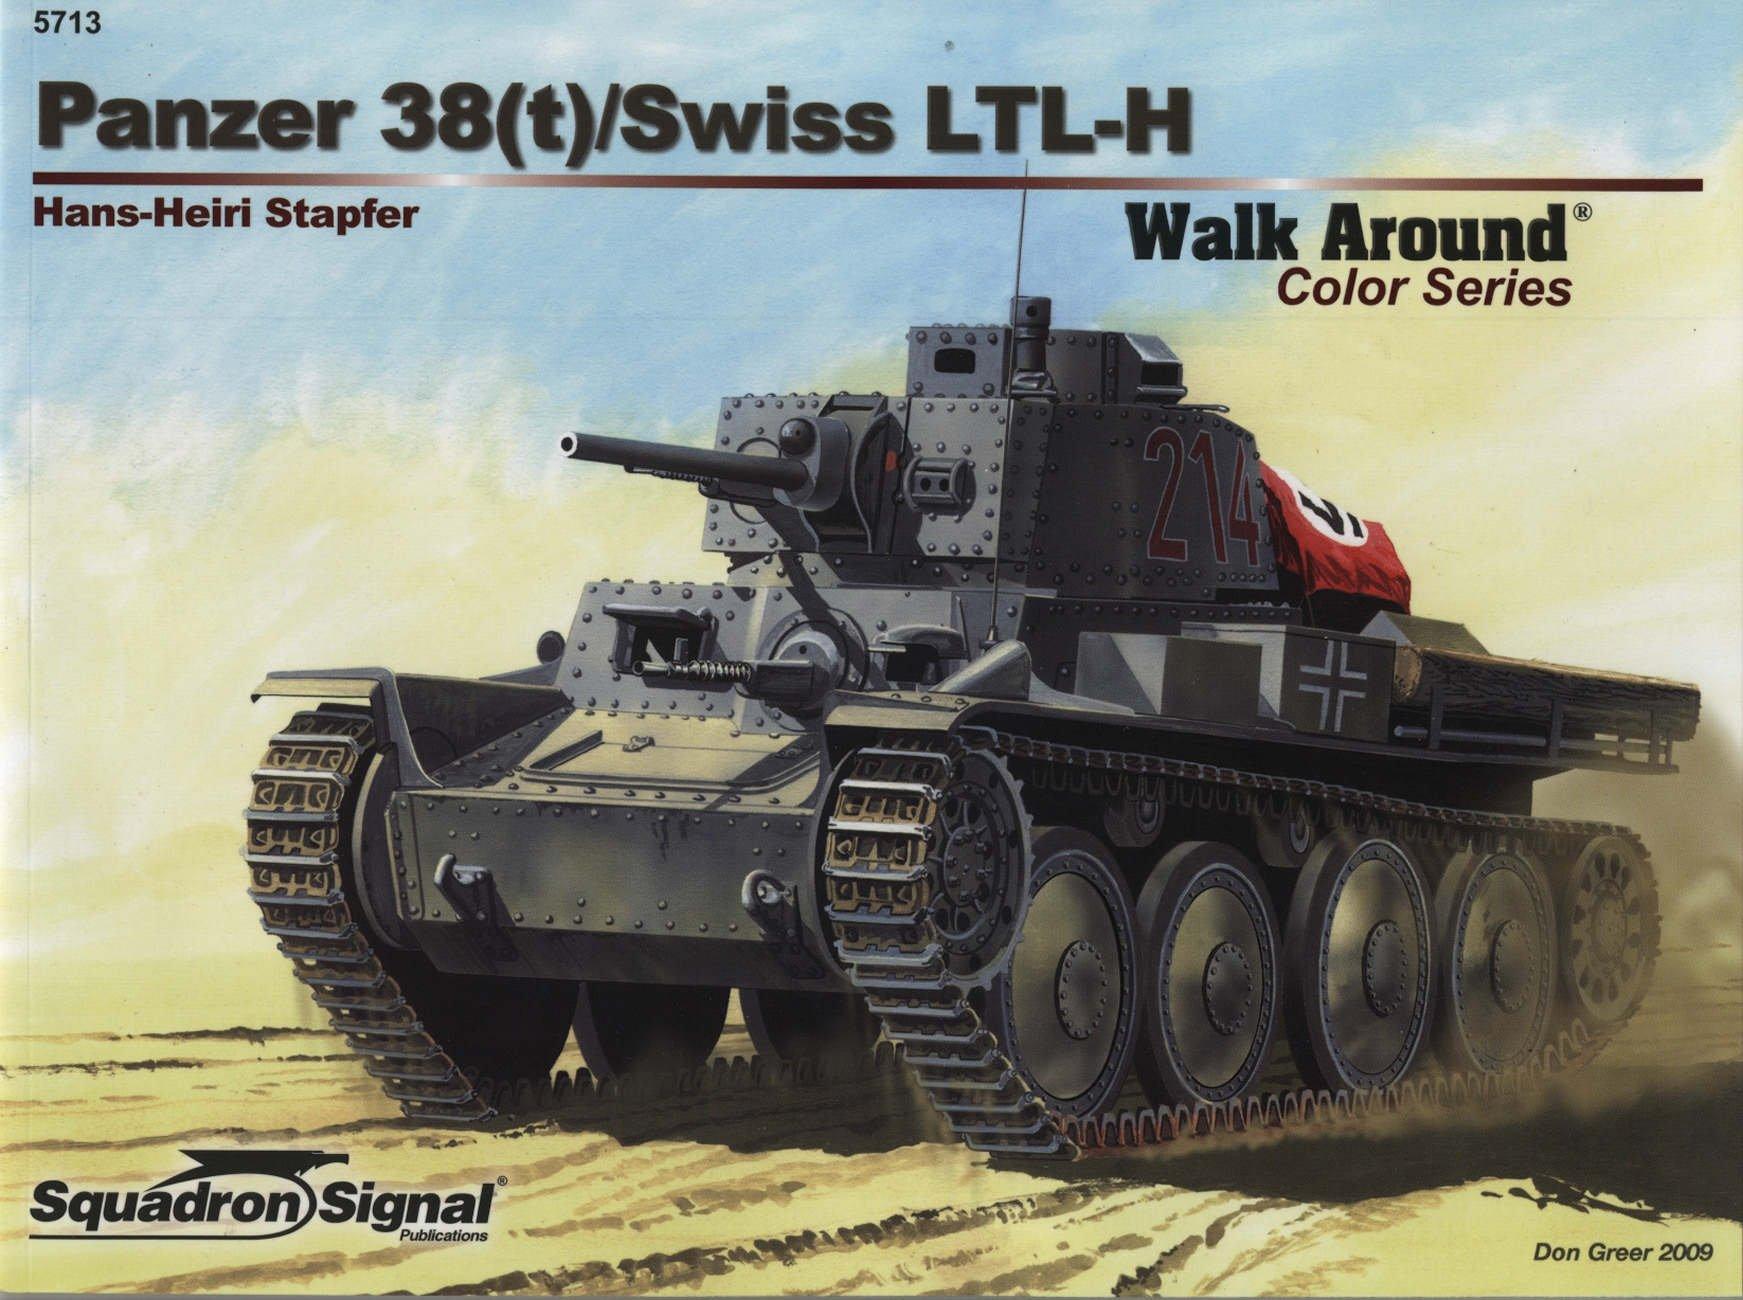 Panzer 38(t) / Swiss LTL-H - Armor Walk Around Color Series